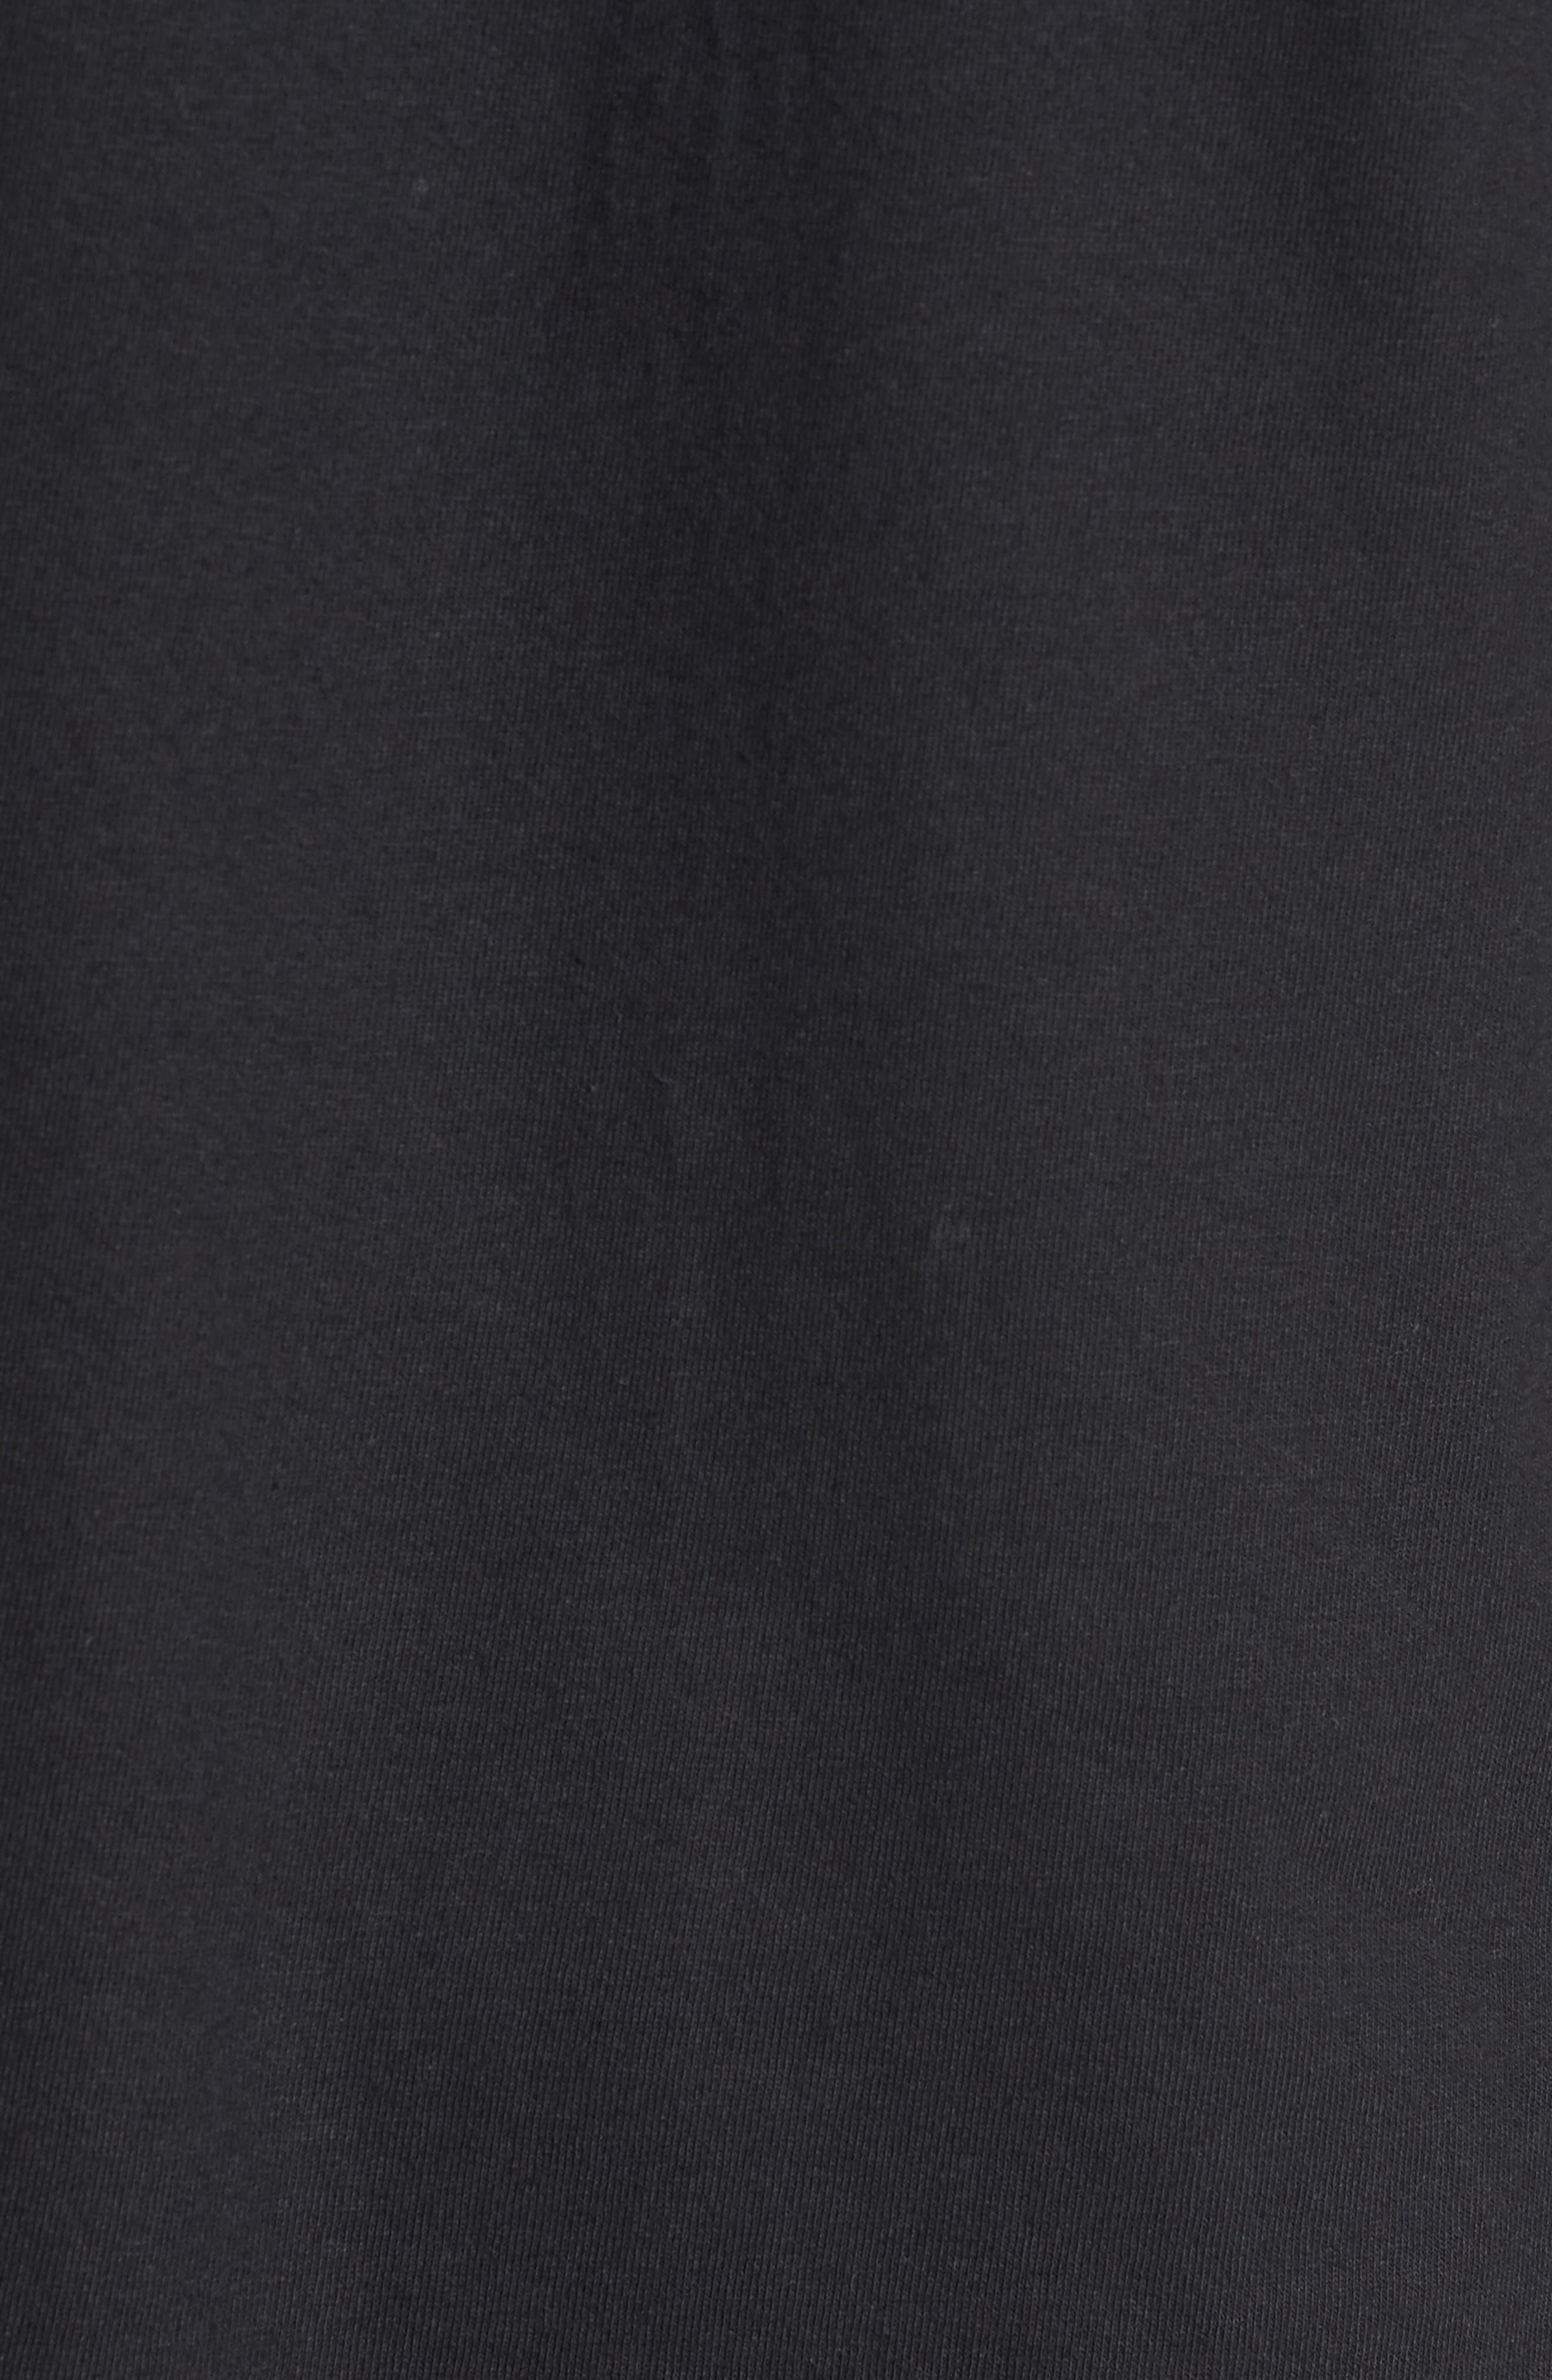 Ice Cube T-Shirt,                             Alternate thumbnail 5, color,                             001